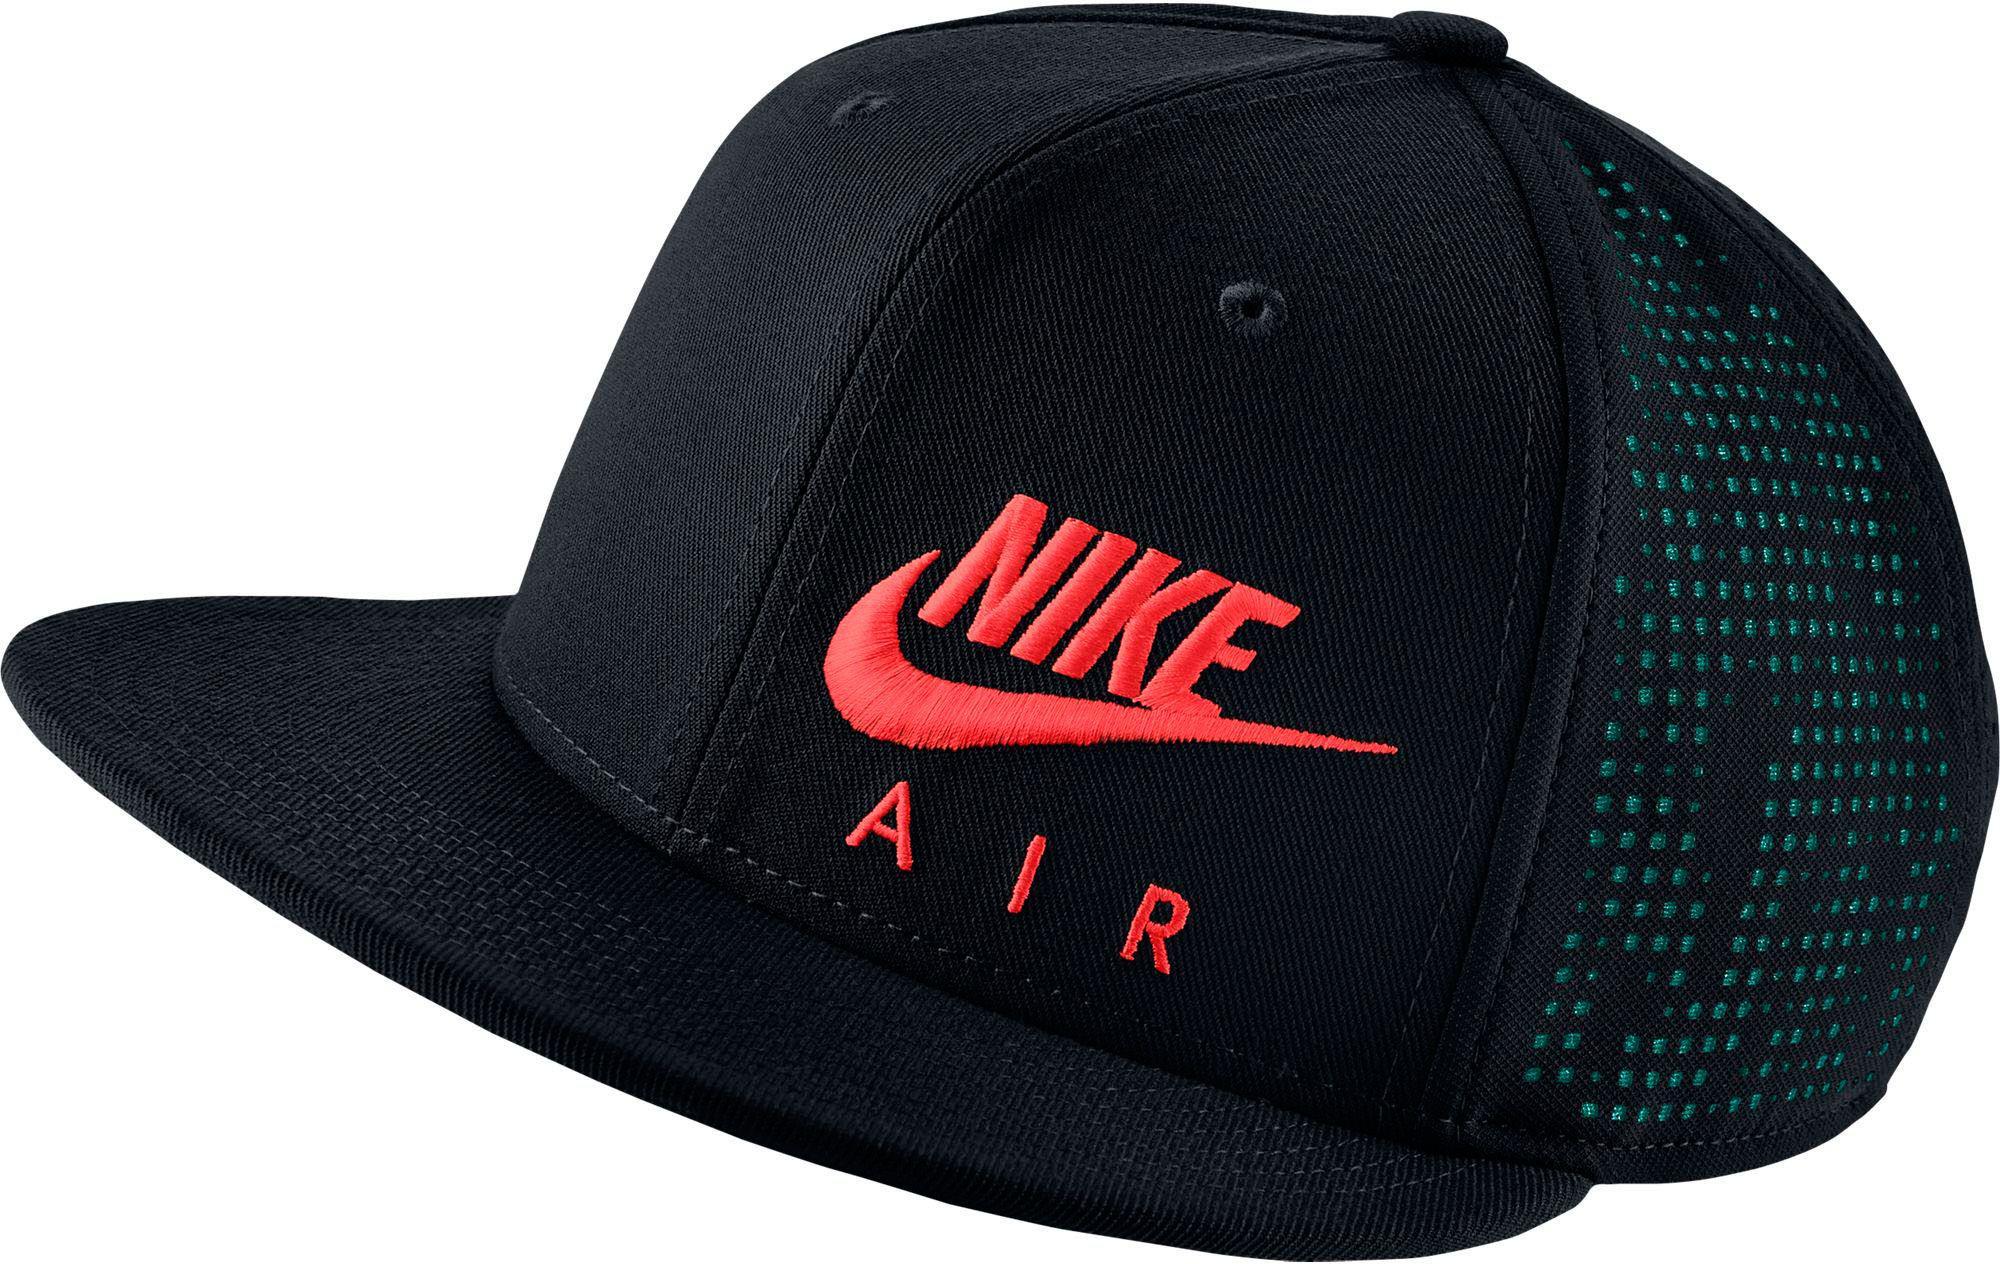 57cb9cd53fd Nike Air Hybrid True Adjustable Snapback Hat in Black for Men - Lyst